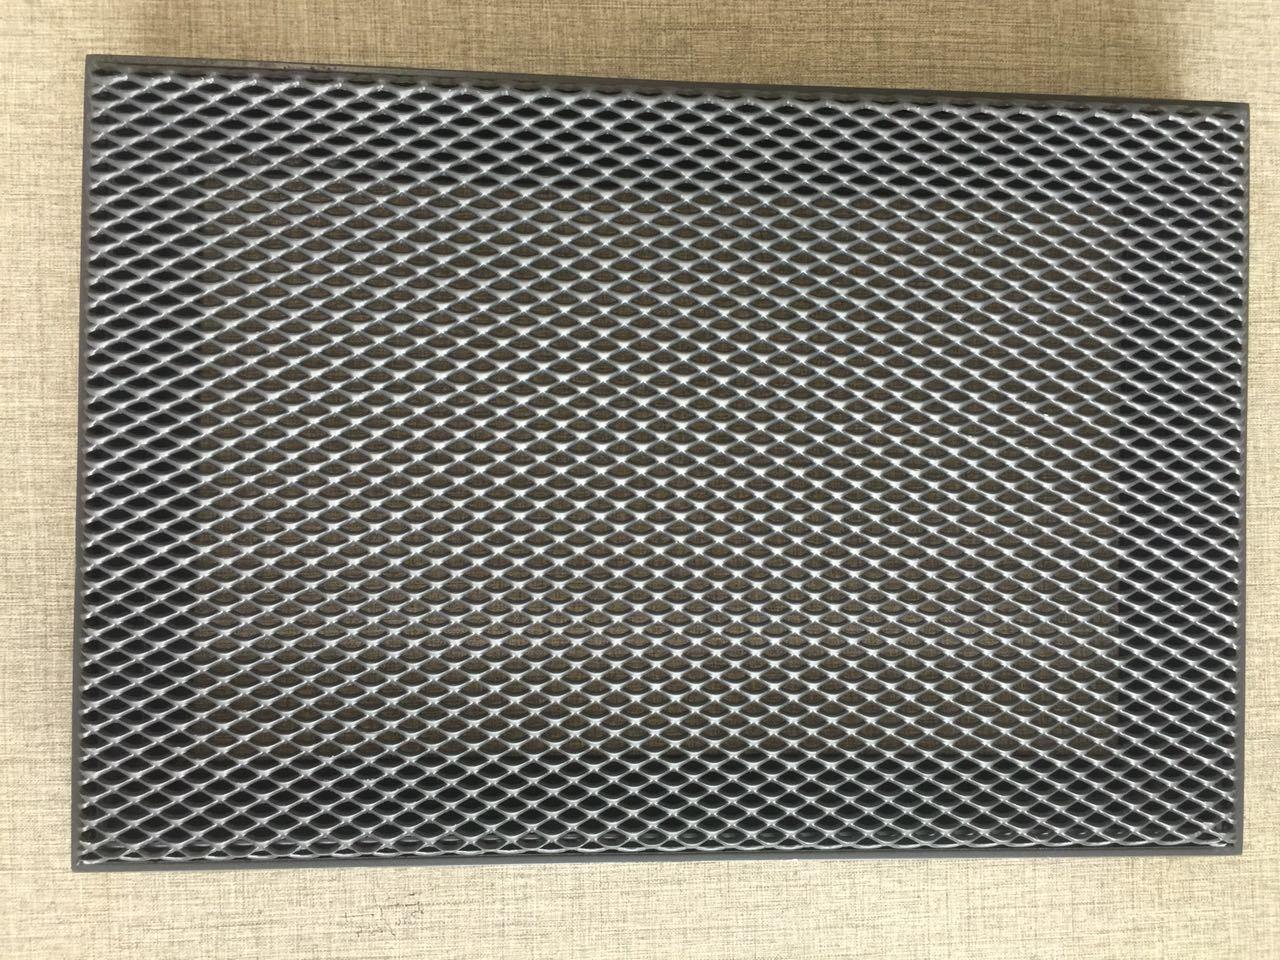 China 2017 customized aluminum non standard ceiling oem metal china 2017 customized aluminum non standard ceiling oem metal meshed aluminum veneer for ceiling tiles curtain wall china metal meshed aluminum veneer doublecrazyfo Gallery